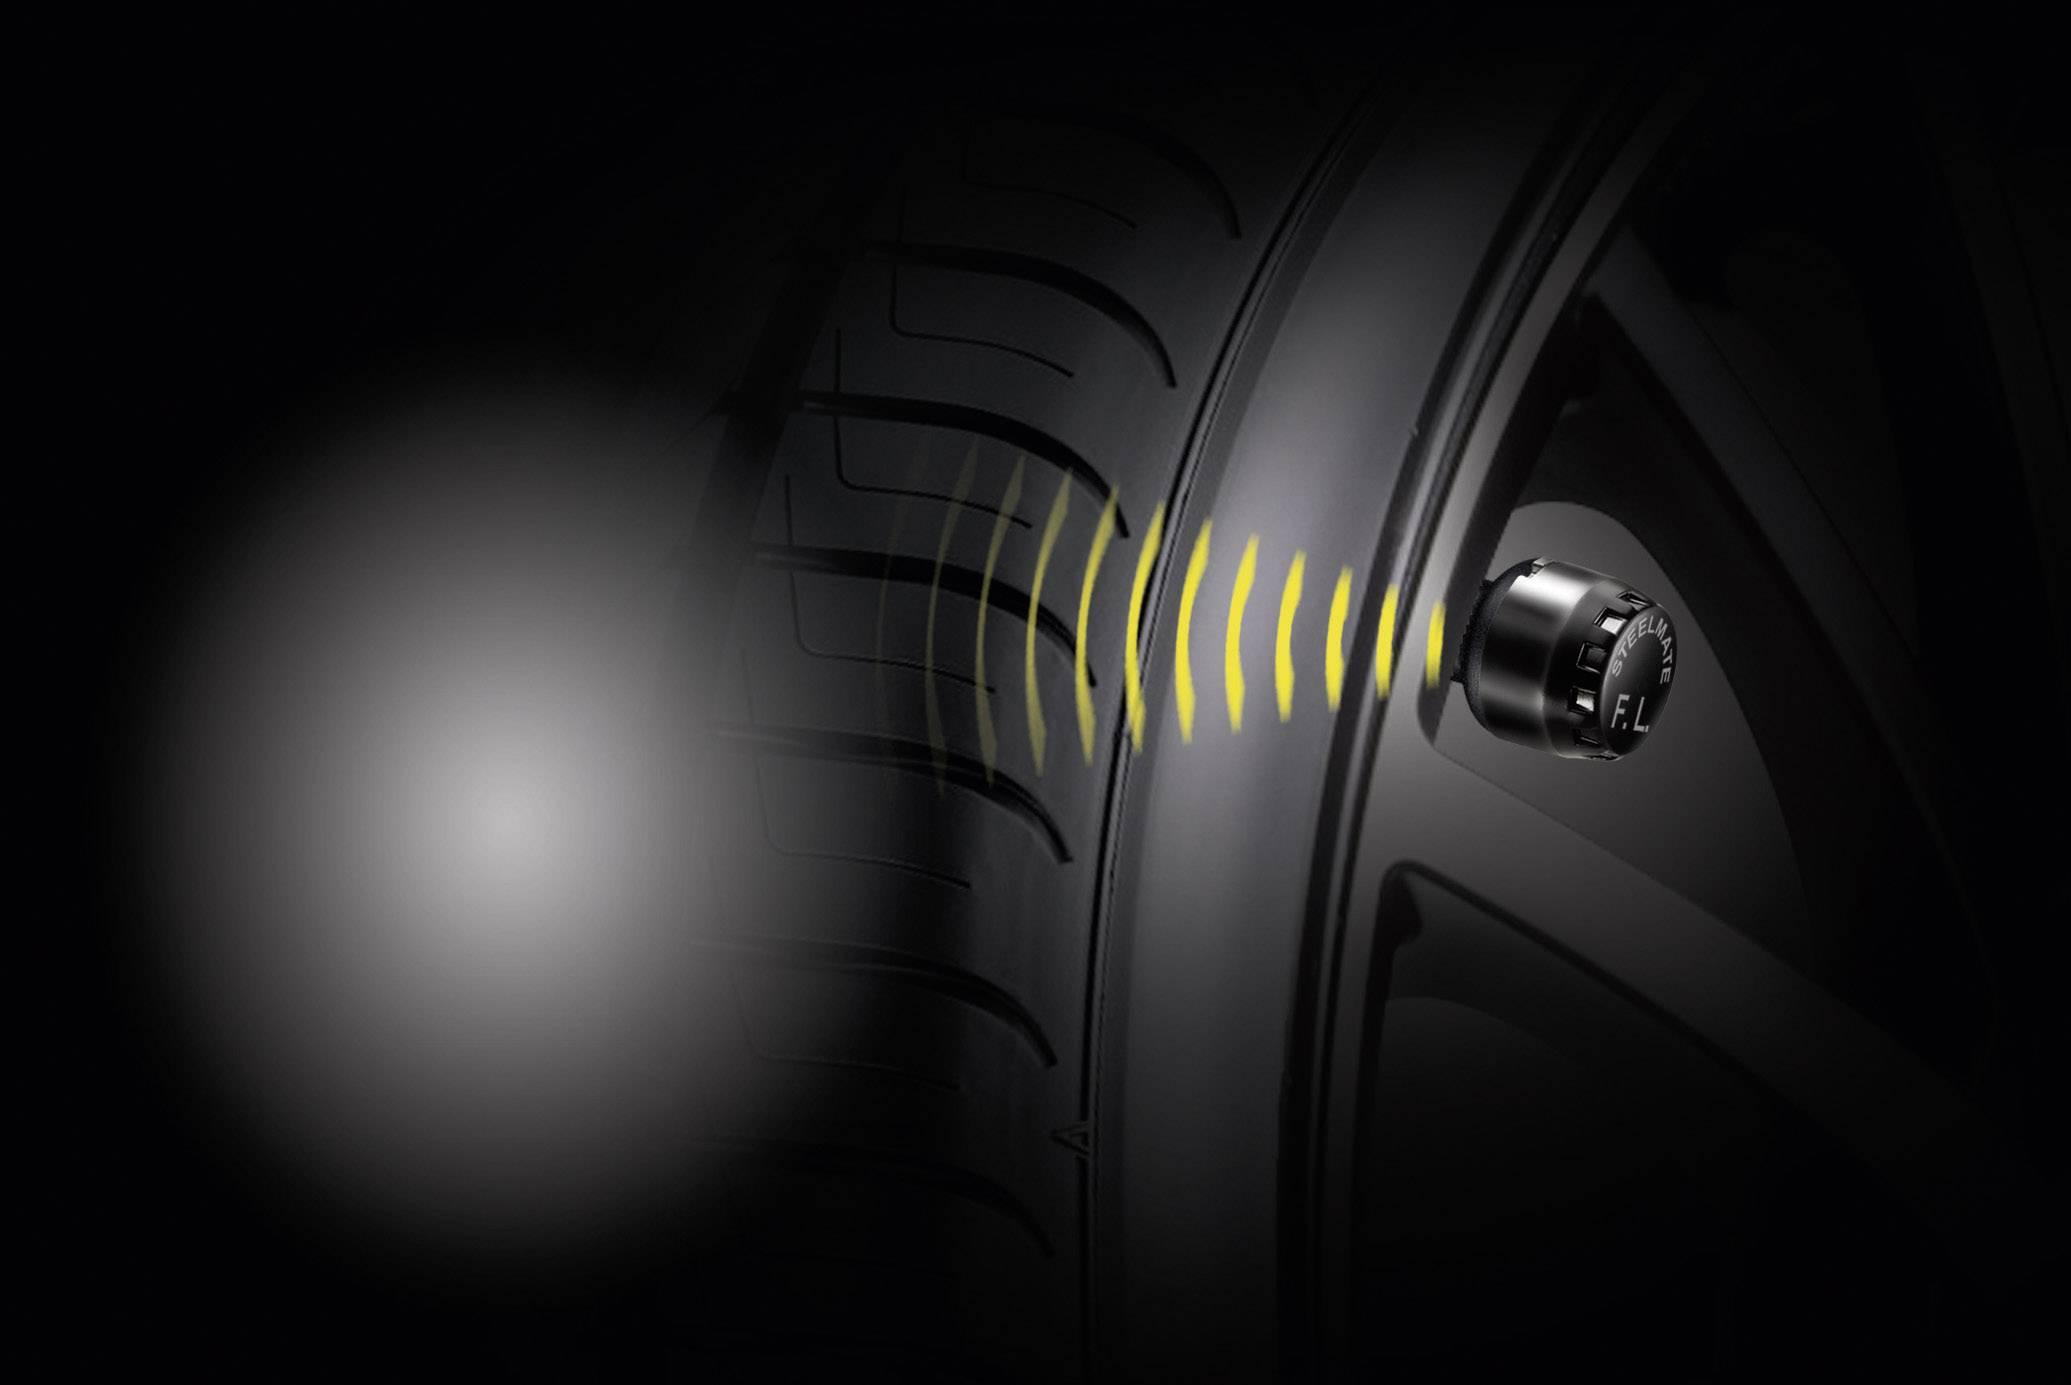 Systém pro kontrolu pneumatik